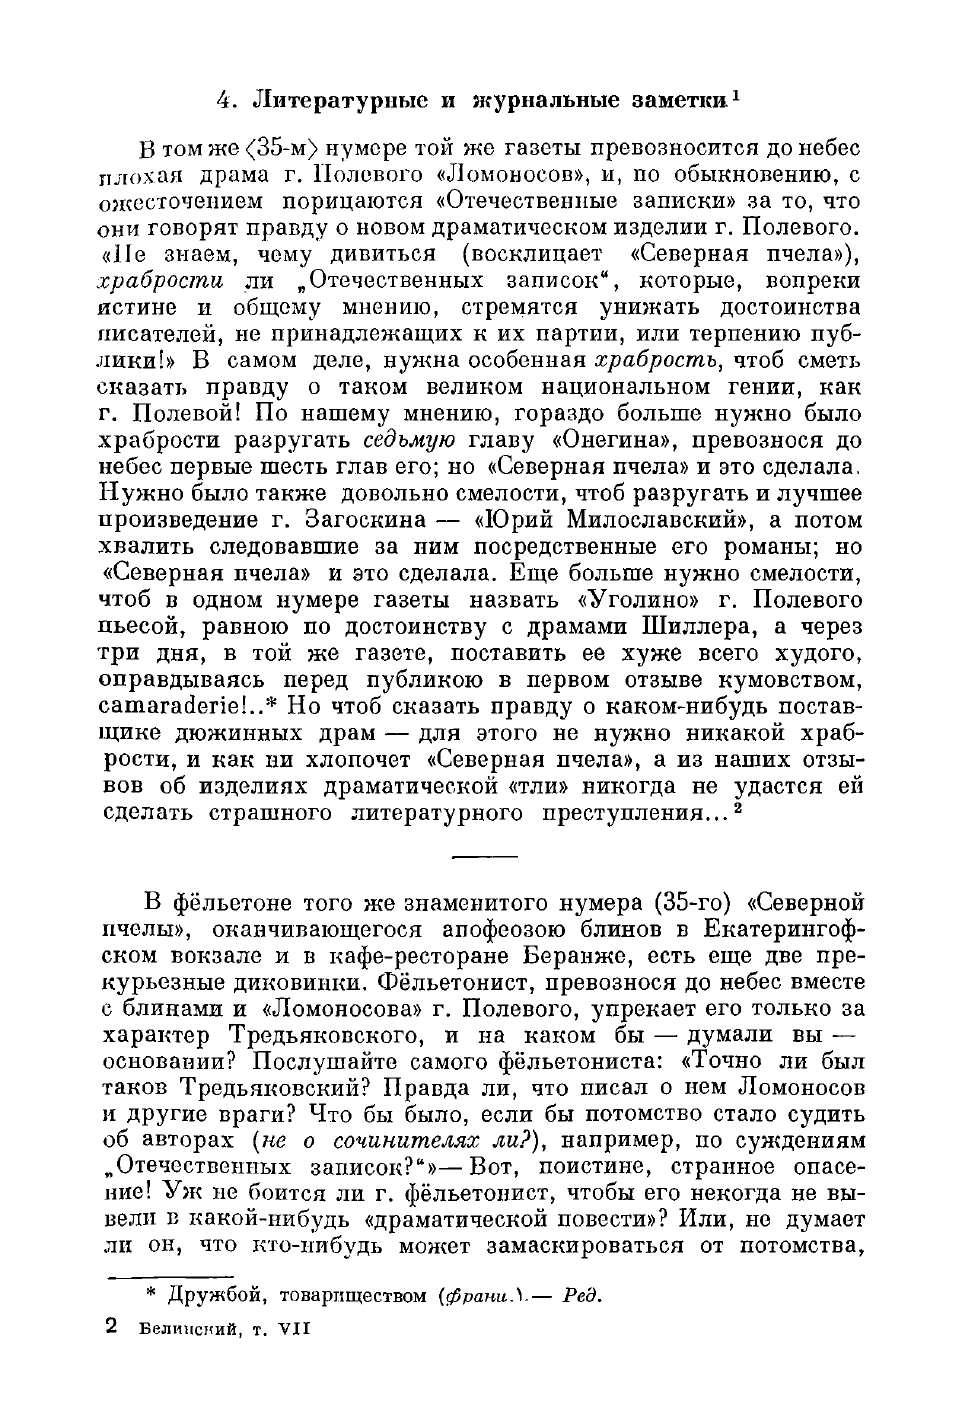 http://images.vfl.ru/ii/1405933609/f3c7df06/5764511.jpg